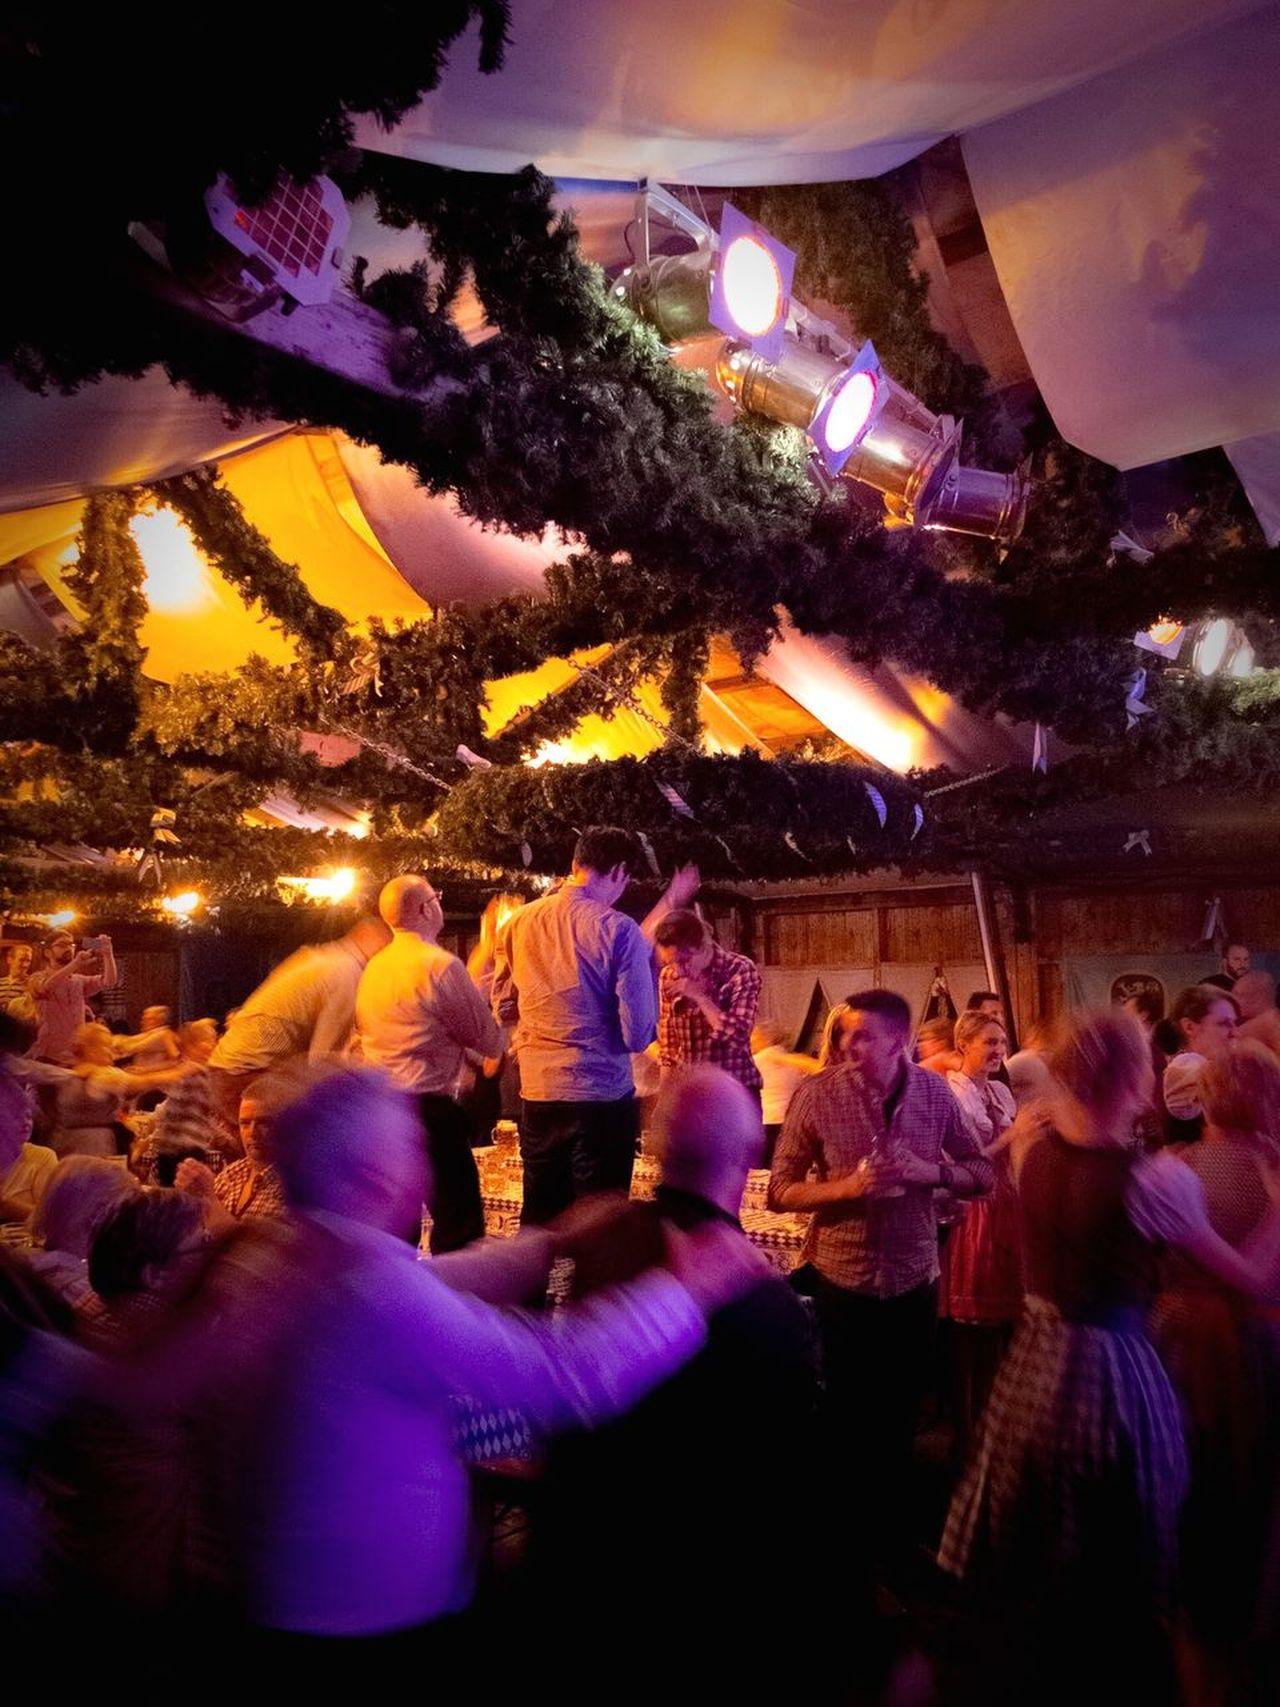 Party Time! Germany GERMANY🇩🇪DEUTSCHERLAND@ Germany🇩🇪 Berlin Berlin Mitte Oktoberfest Bayern